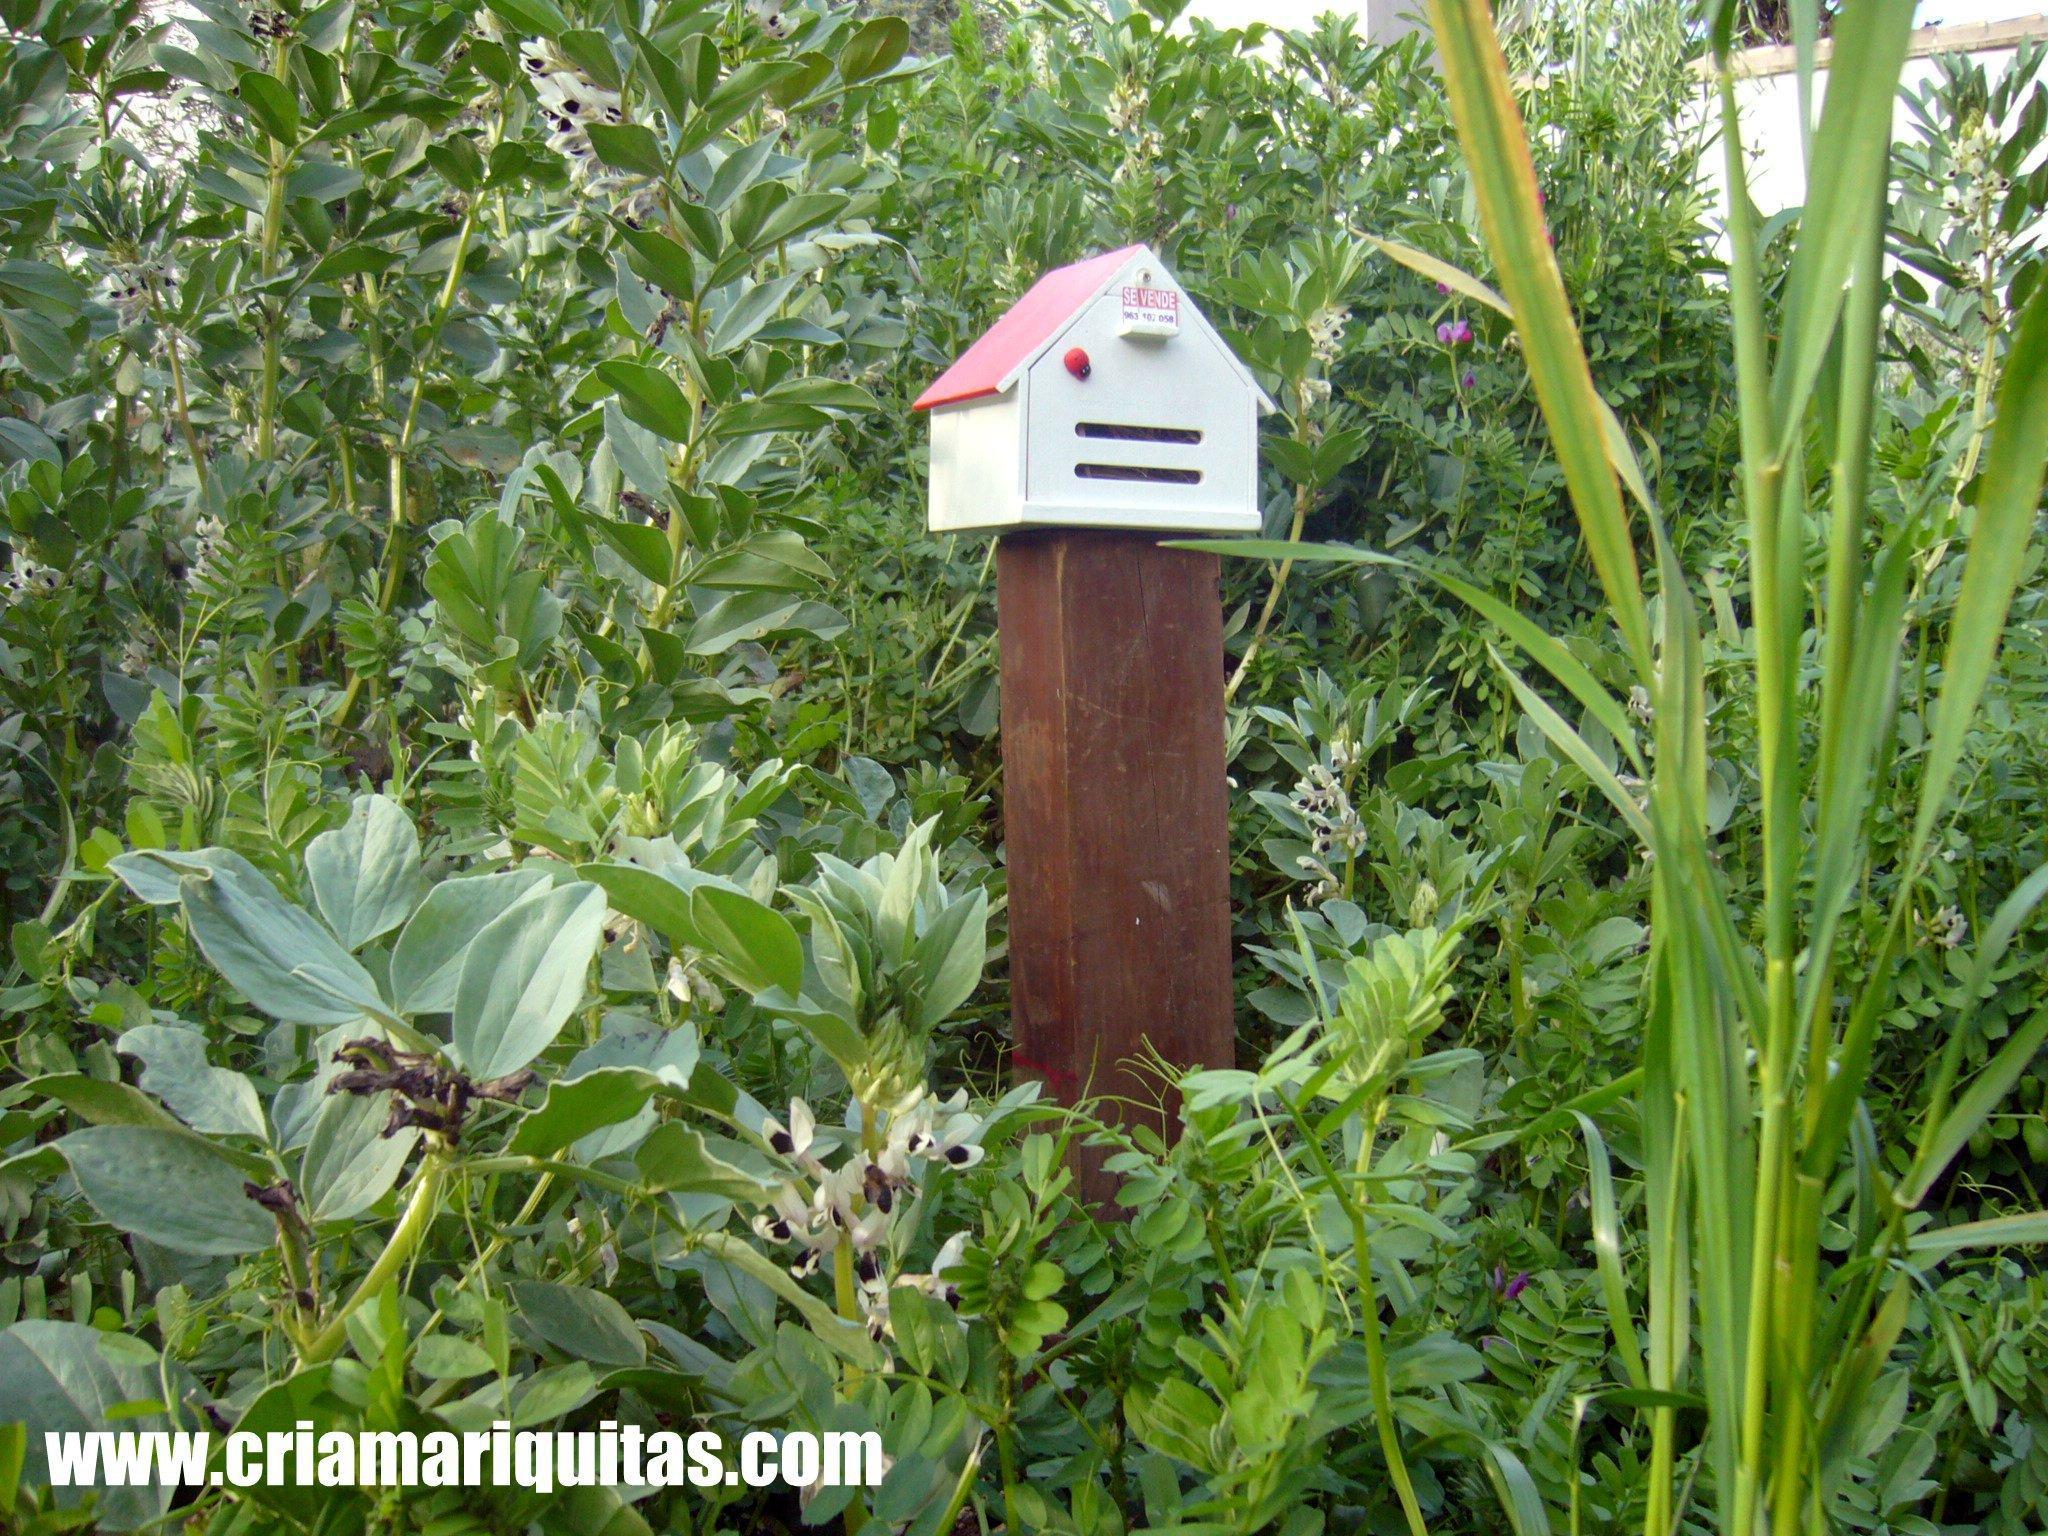 Mariquitas casas paperblog for Modelos de jardines en casa